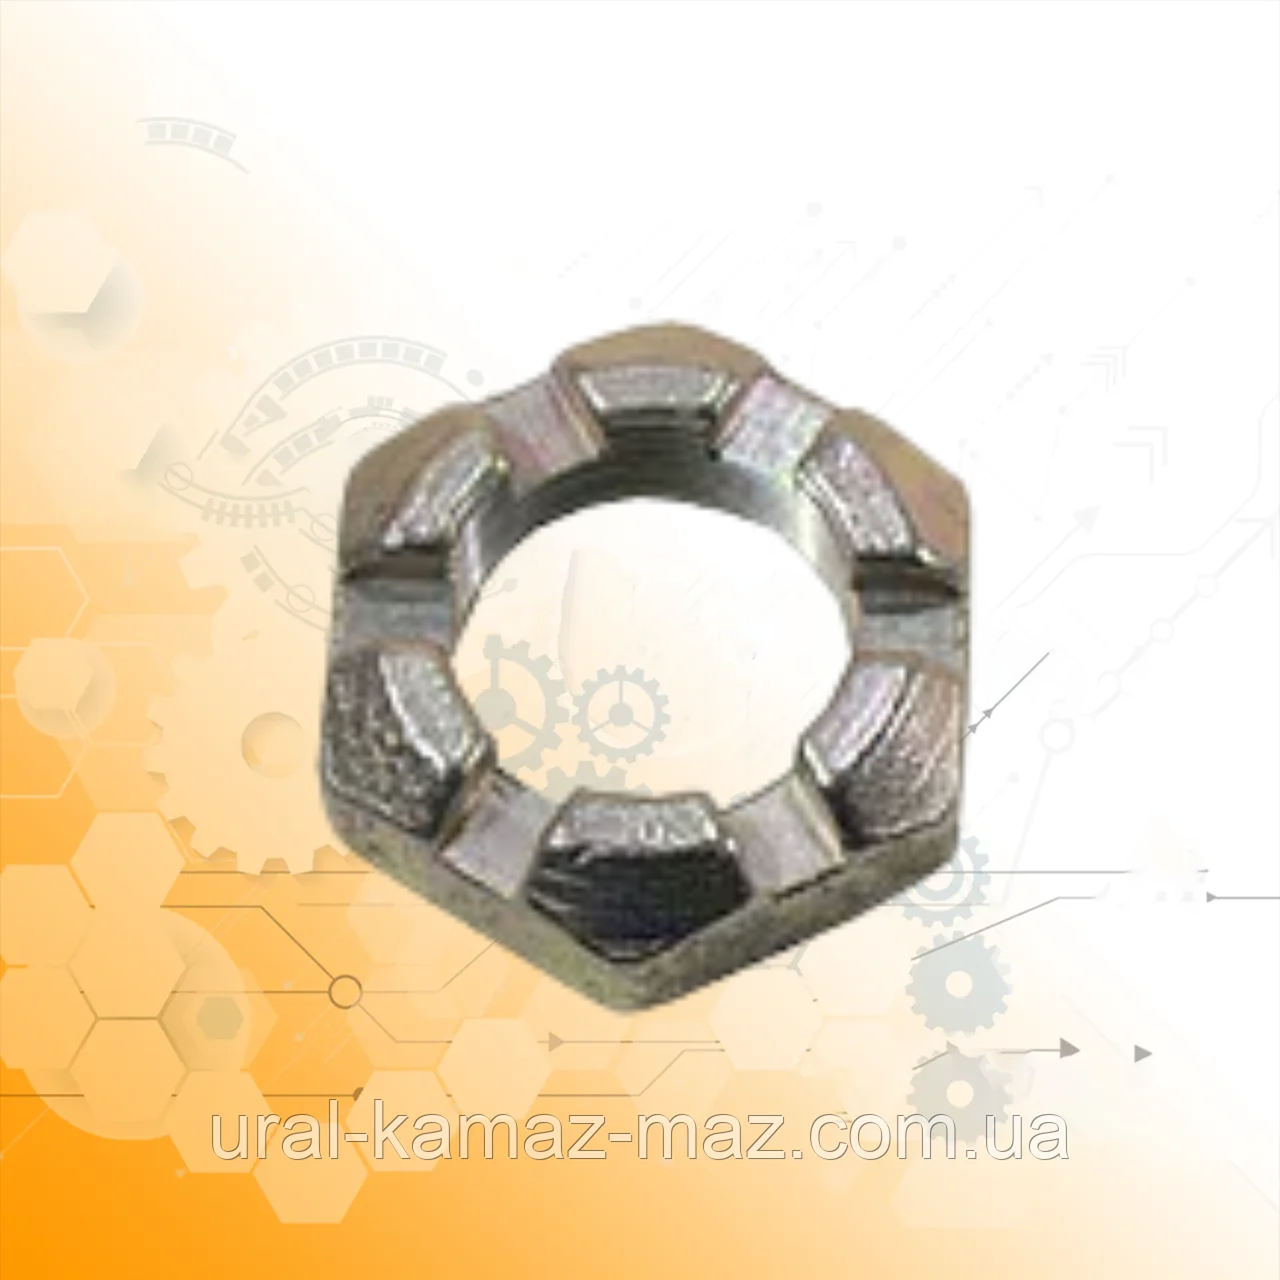 Гайка М30*1,5 фланца редуктора 335033